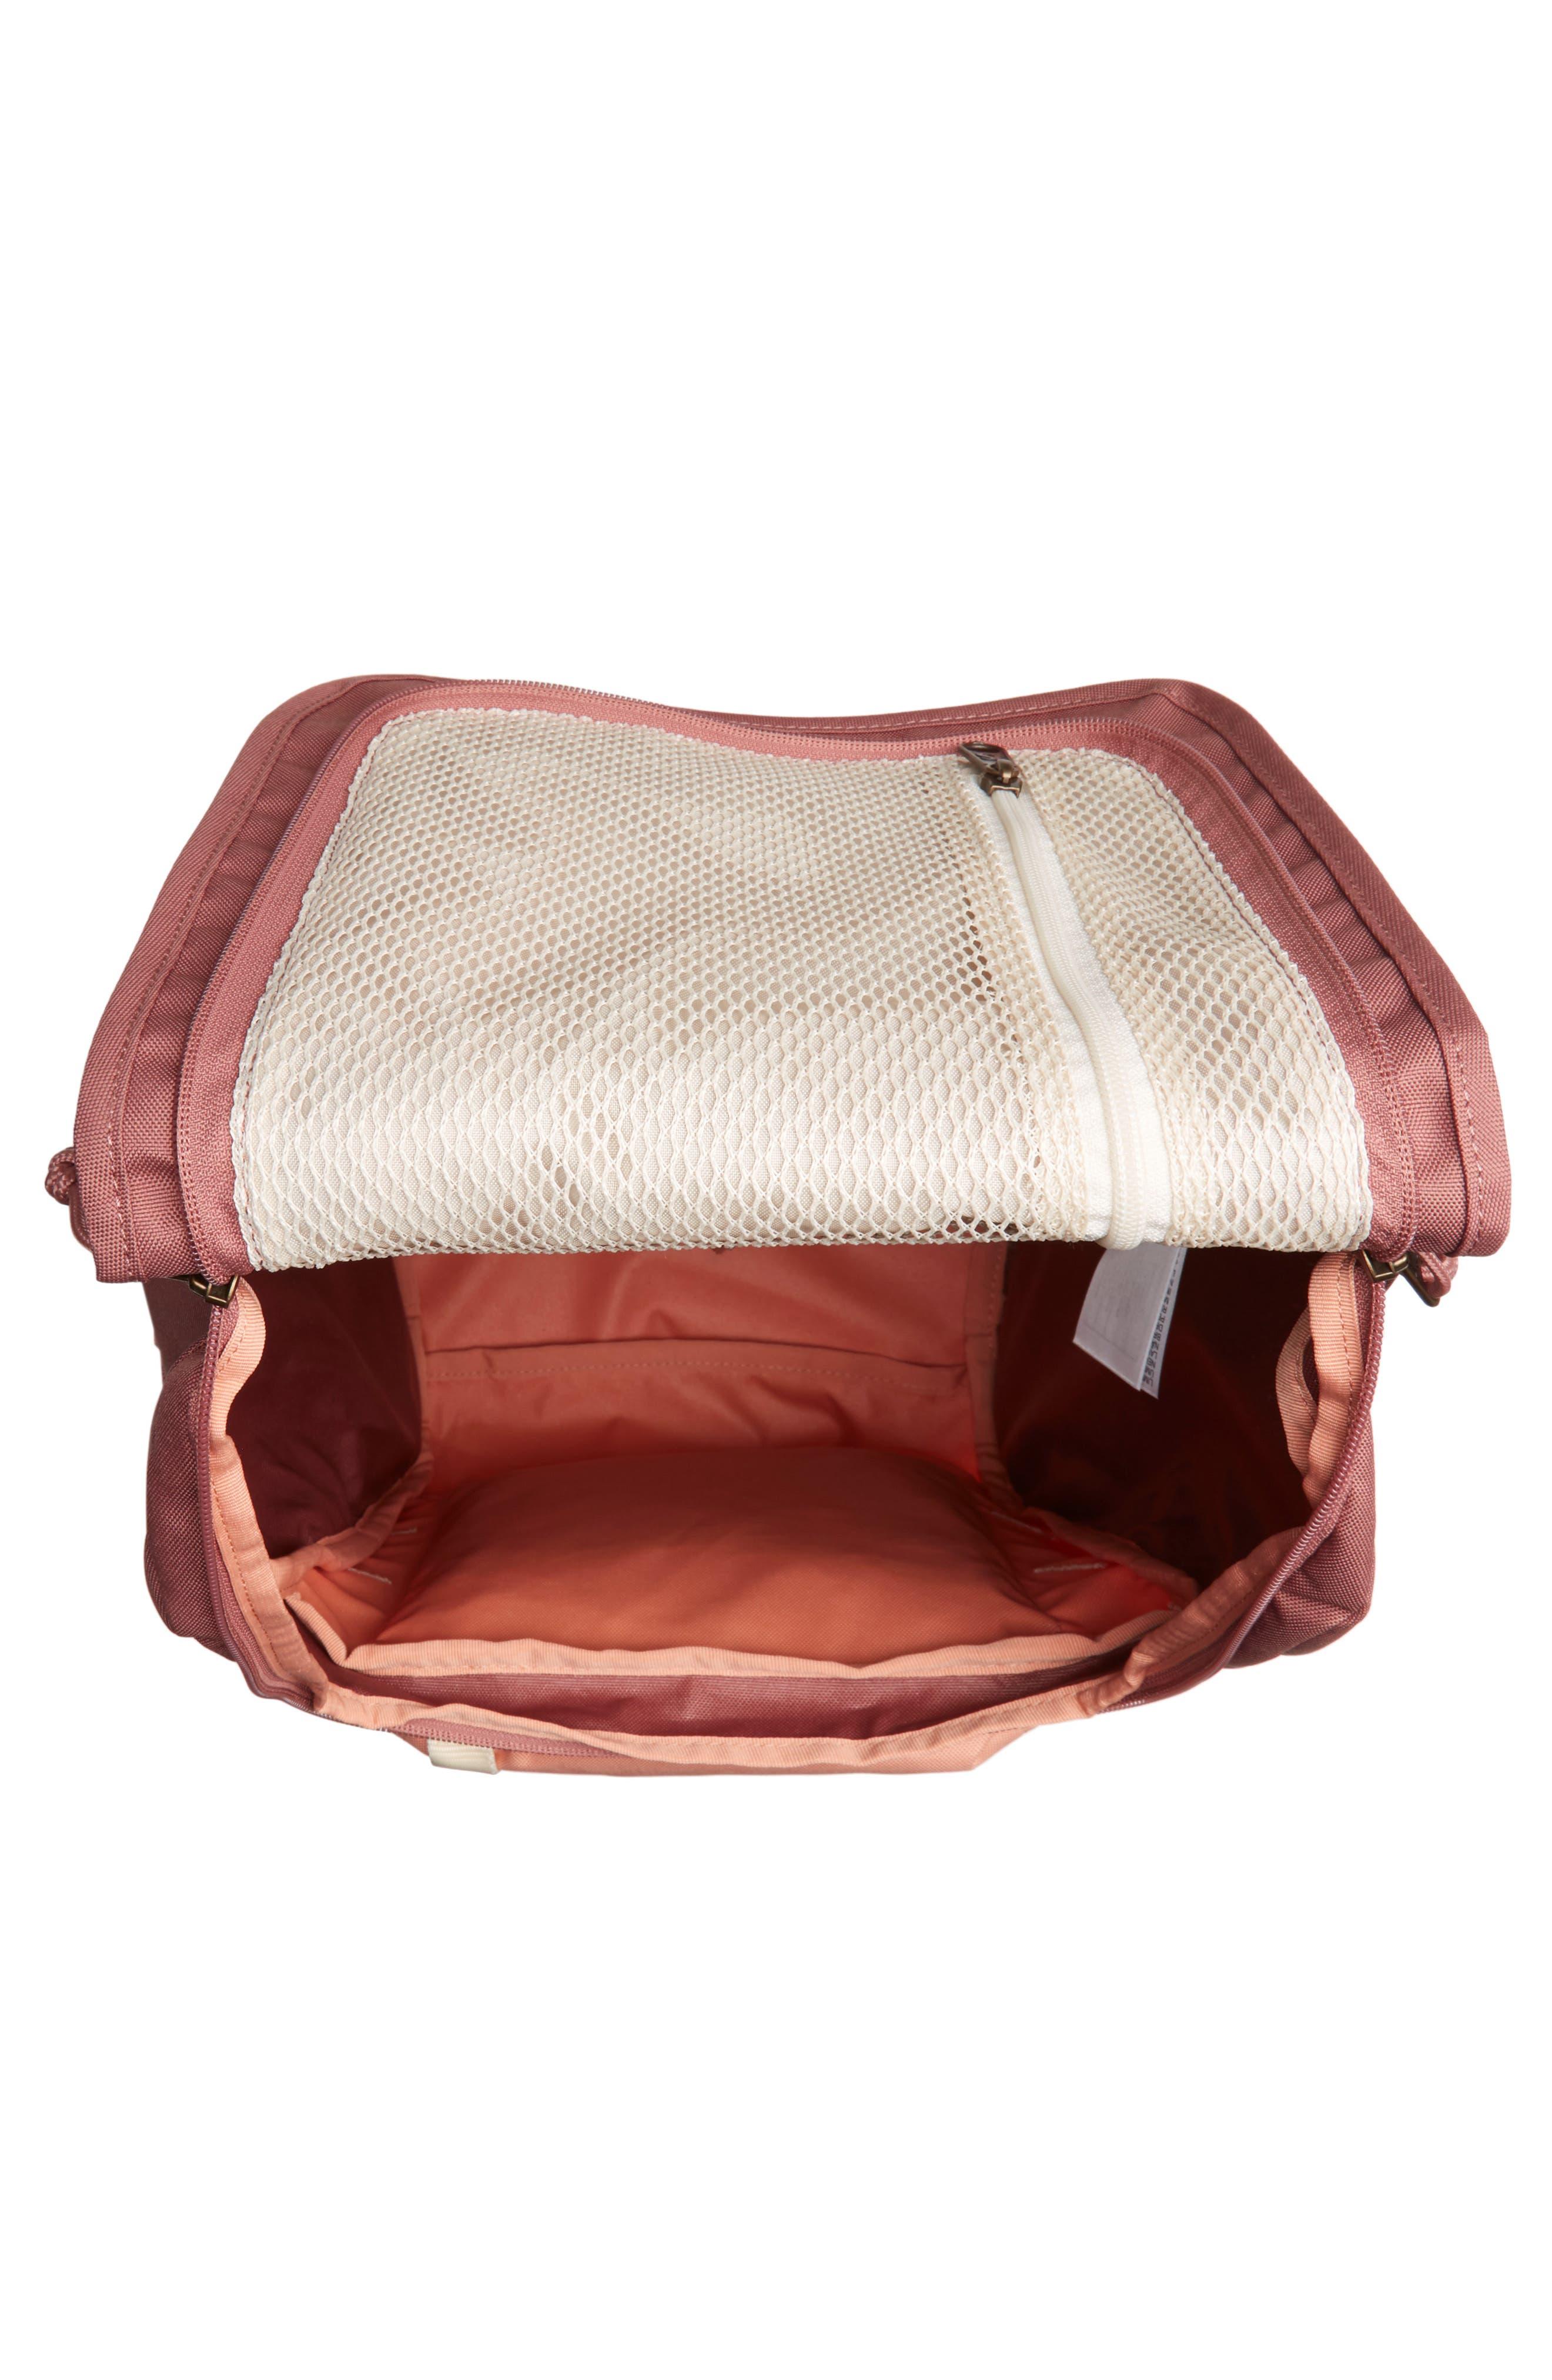 JANSPORT, Hatchet Backpack, Alternate thumbnail 5, color, MOCHA/ CLAY